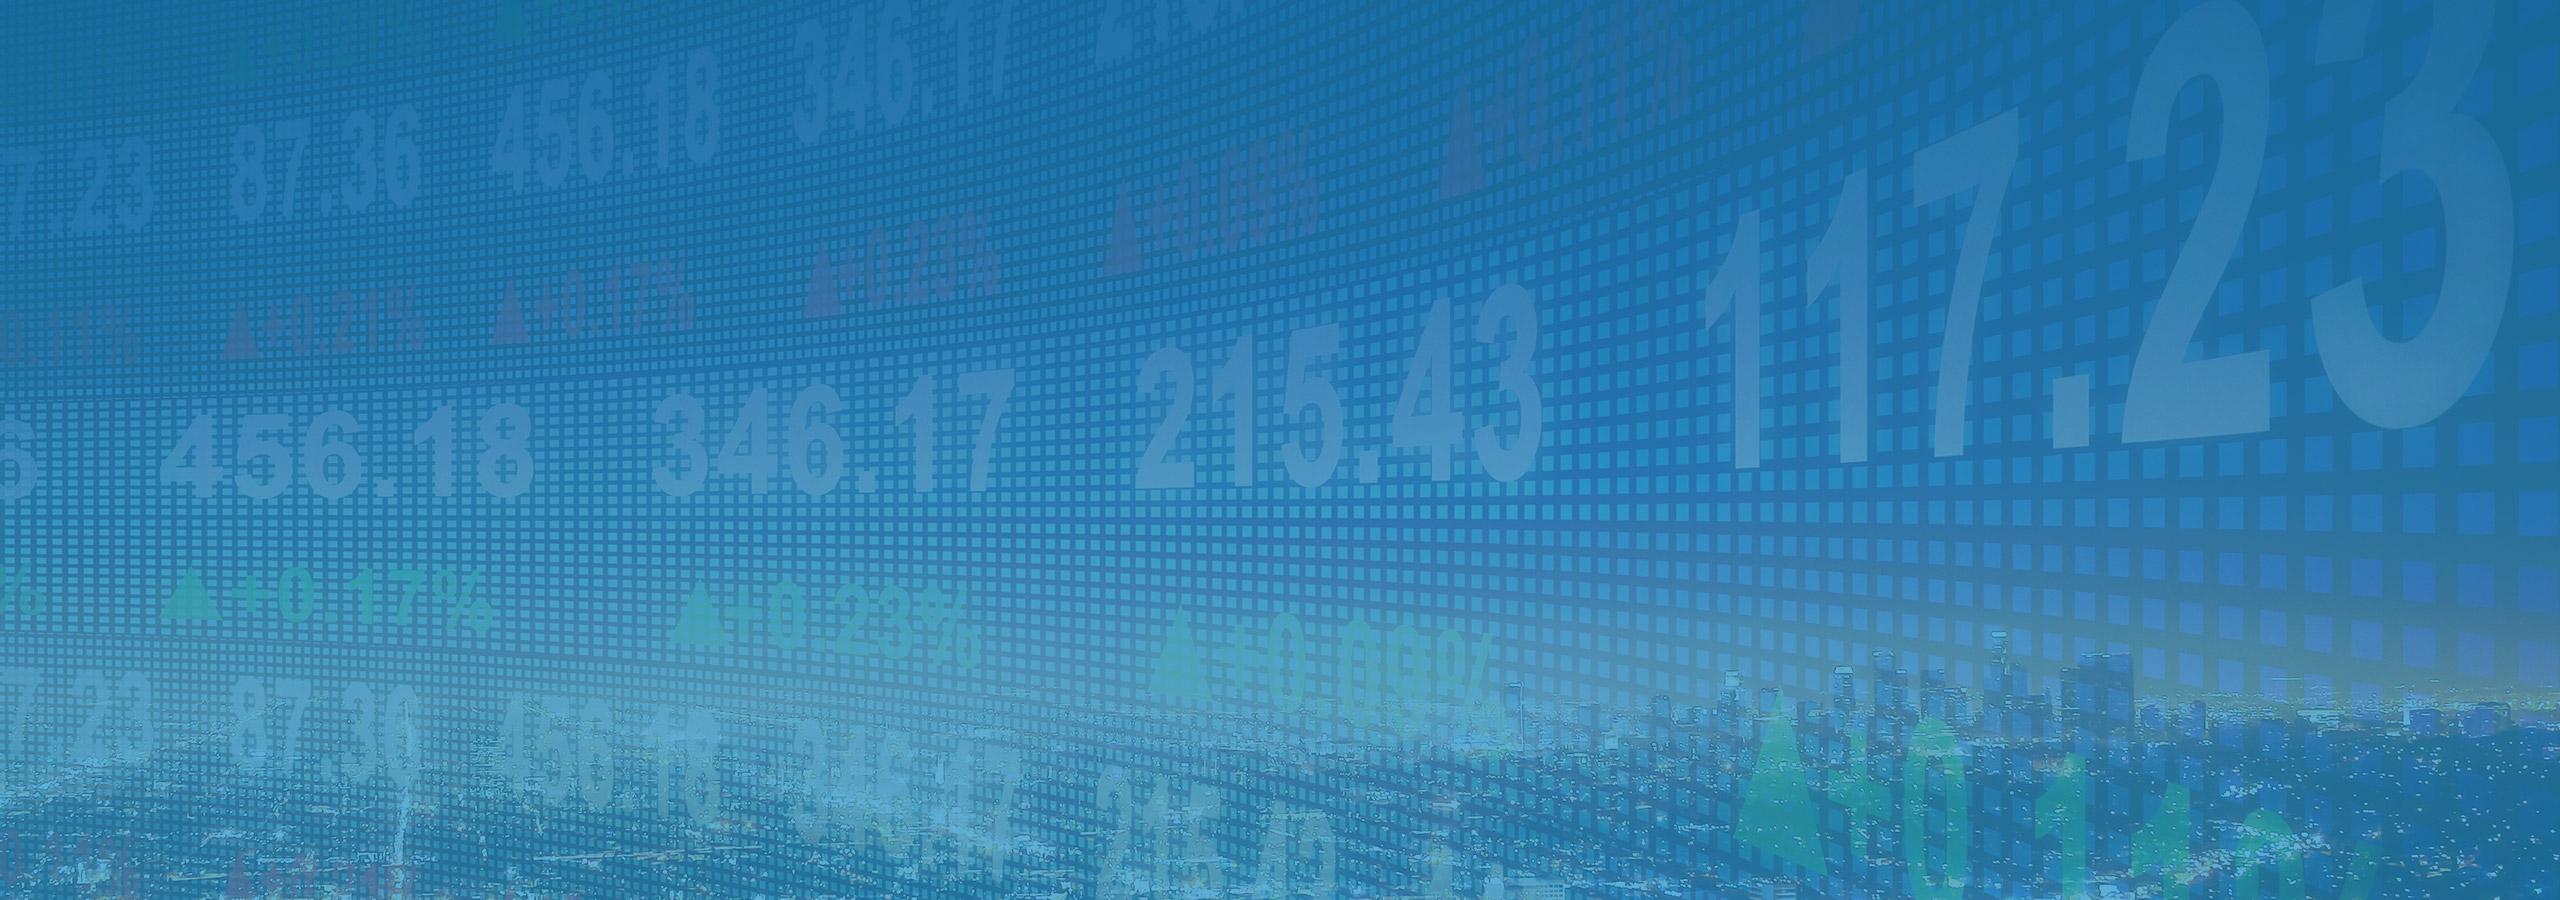 Breach webinar image of figures on a screen